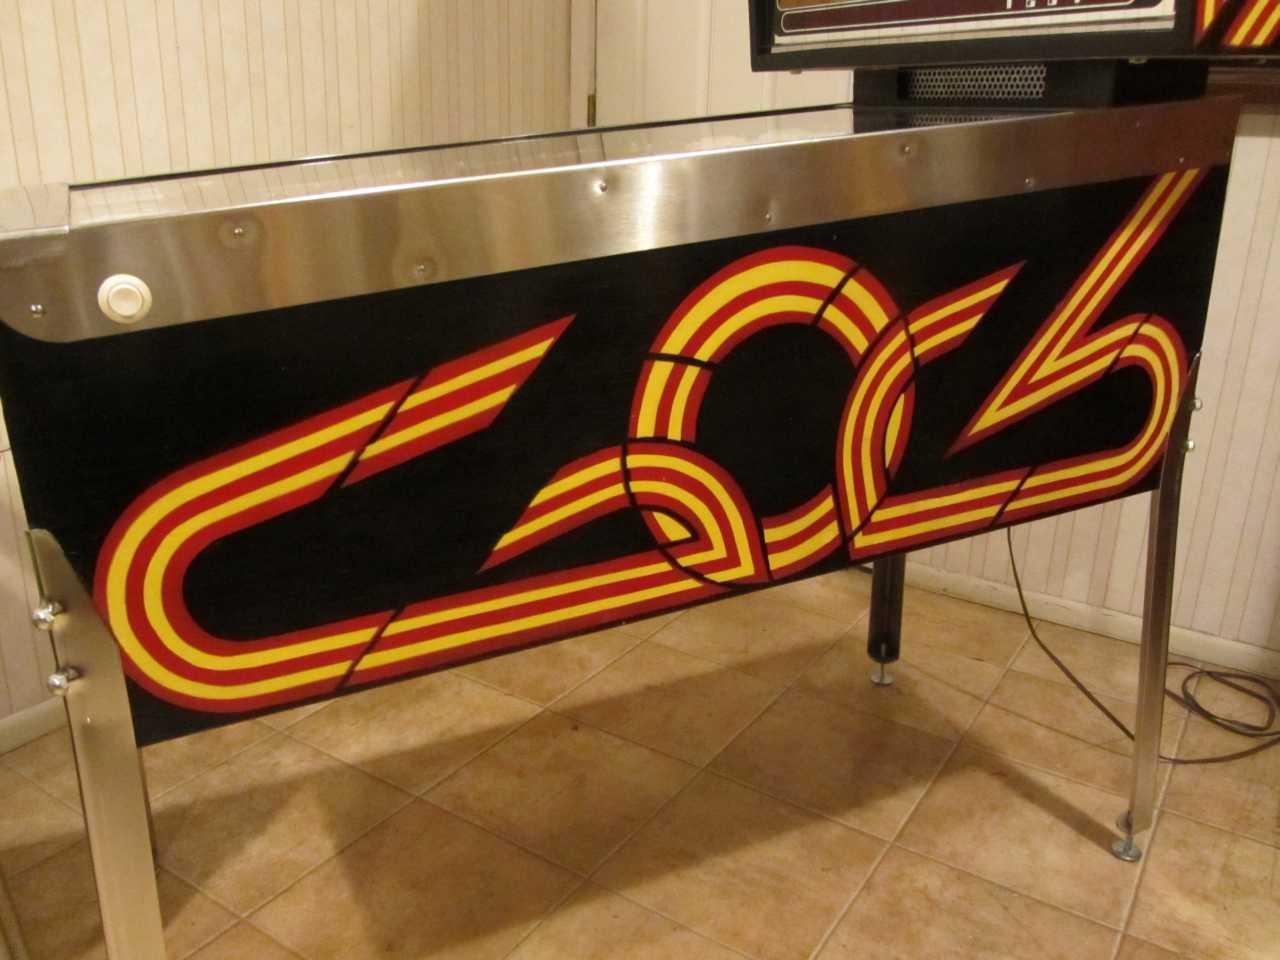 Williams Firepower Pinball Machine 2 Pinballmania Llc Neon Sign Schematics Contact